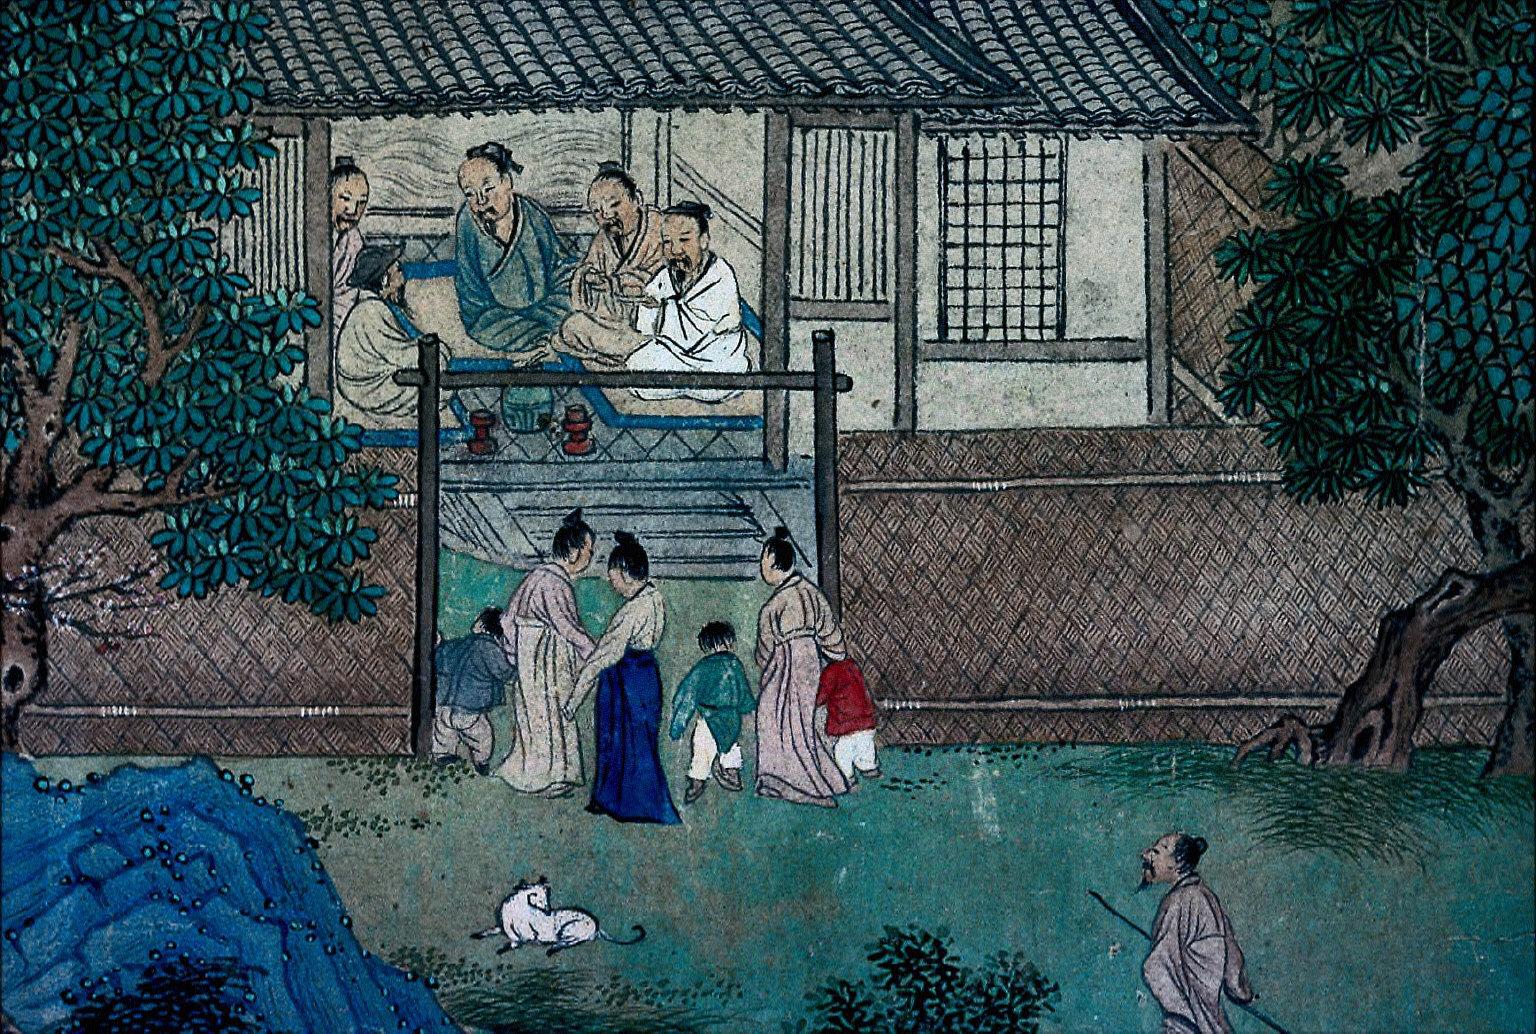 Peach Blossom Spring [Tao Hua-chien], poem by T'ao Ch'ien (365-427)